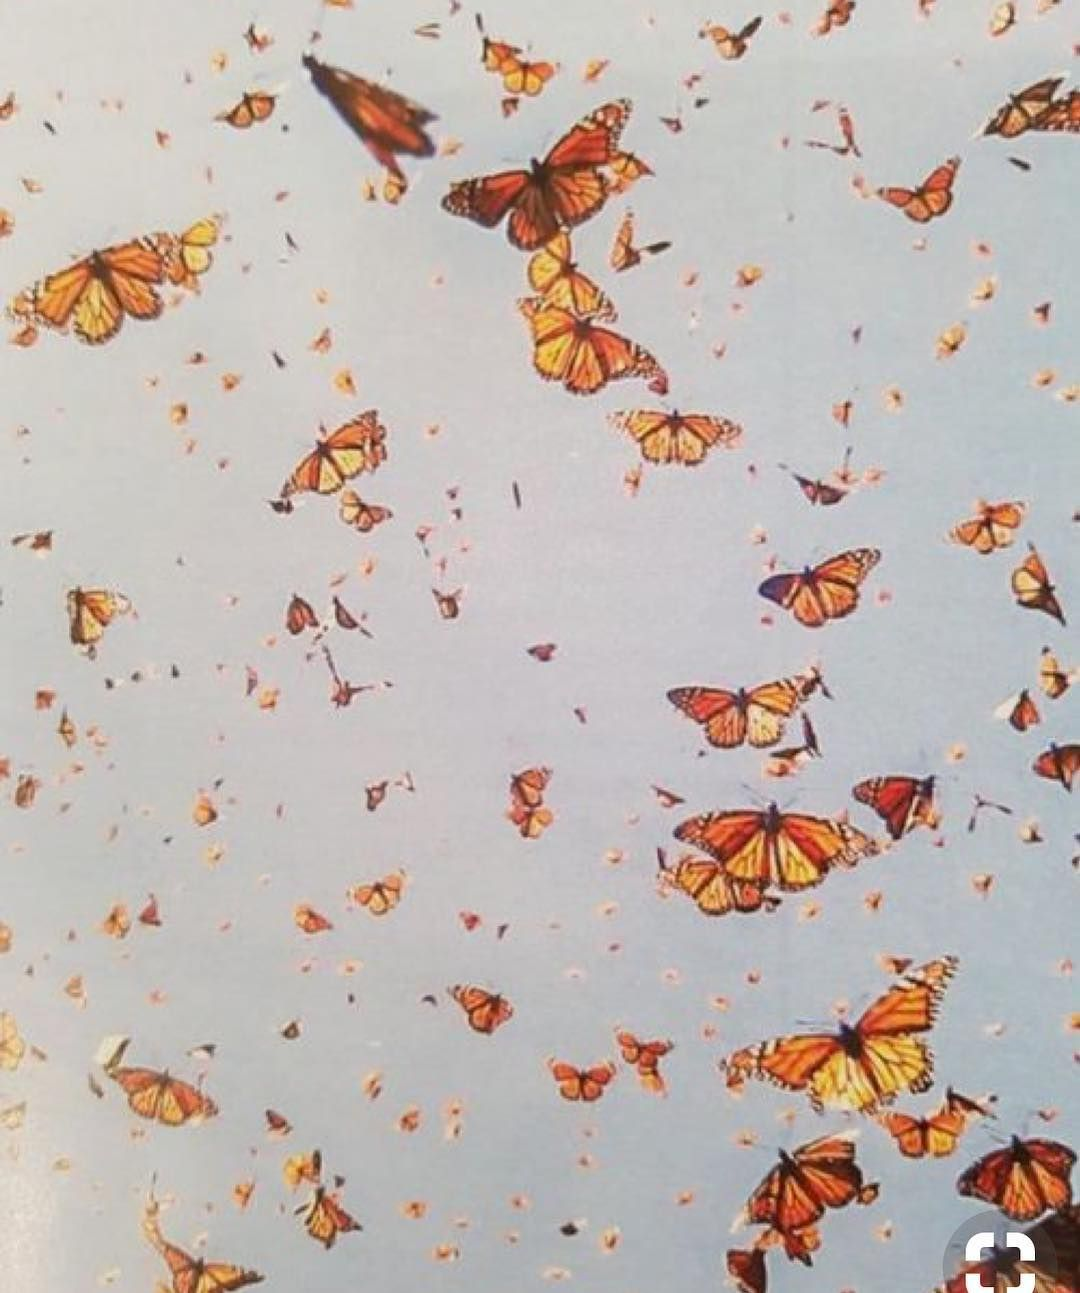 L Academie On Instagram Feeling Butterflies Aesthetic